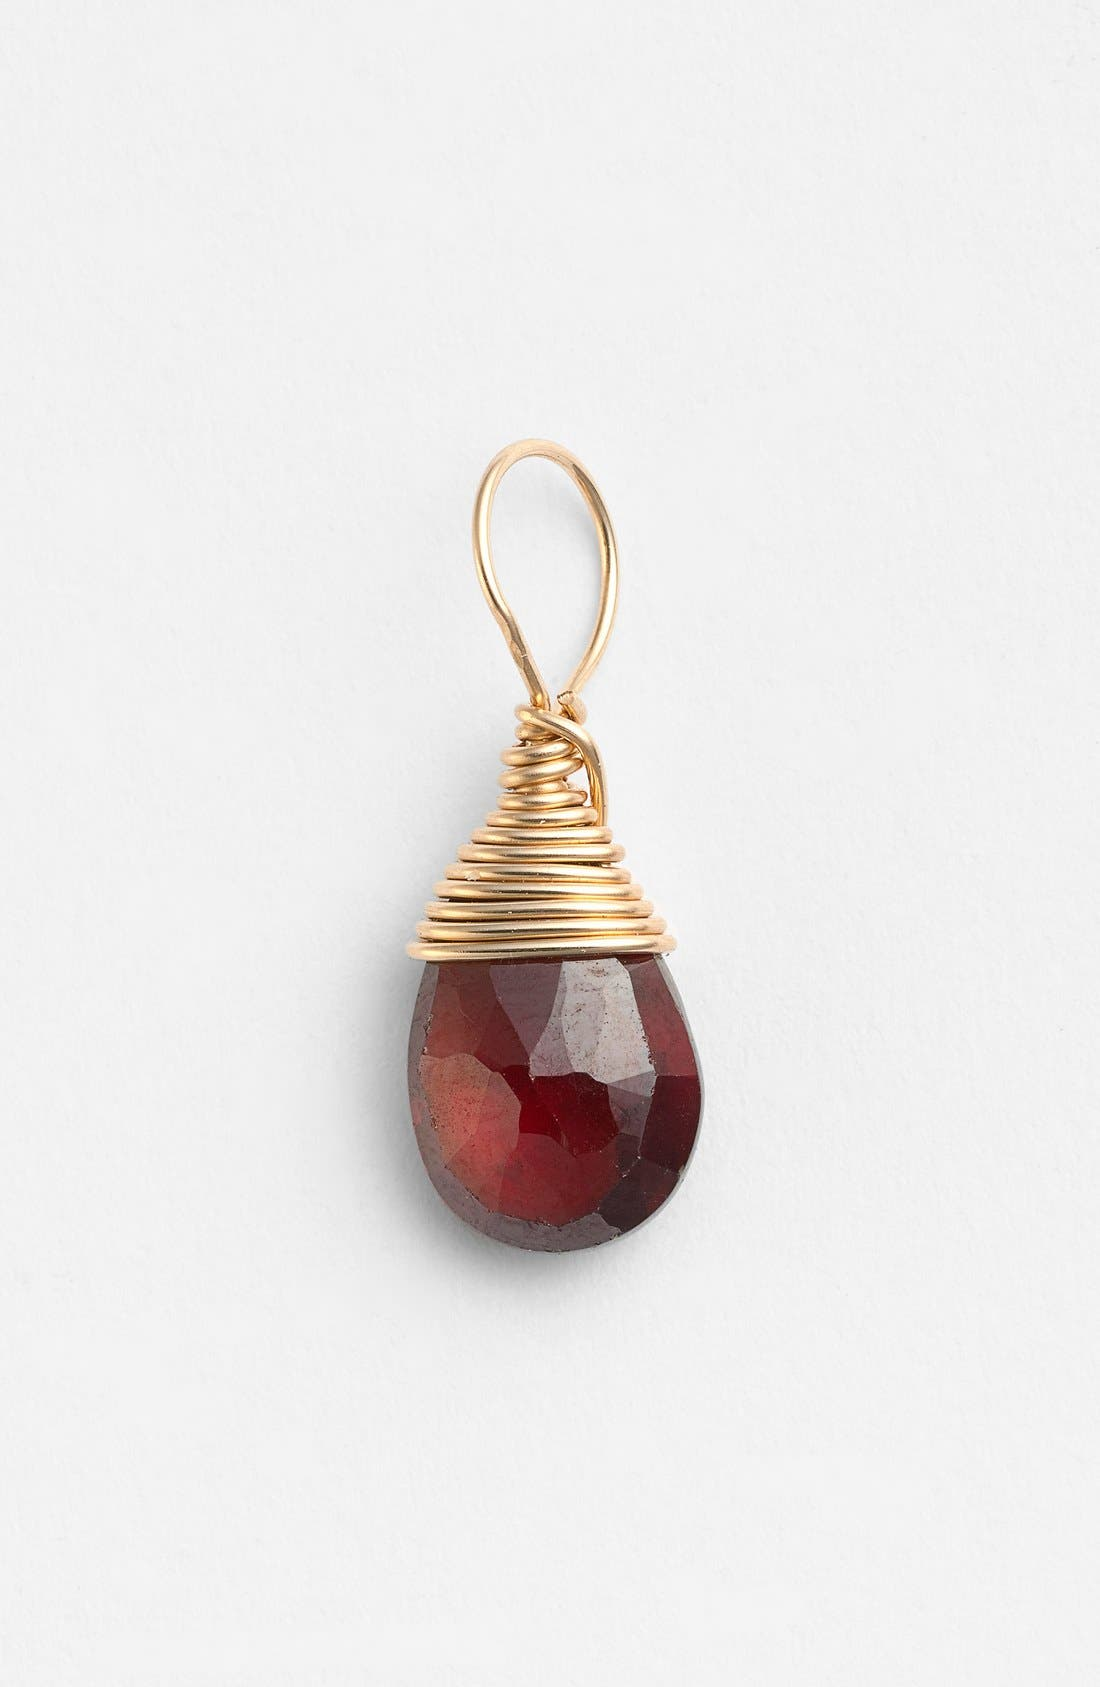 14k-Gold Fill & Semiprecious Stone Charm,                             Main thumbnail 1, color,                             GARNET